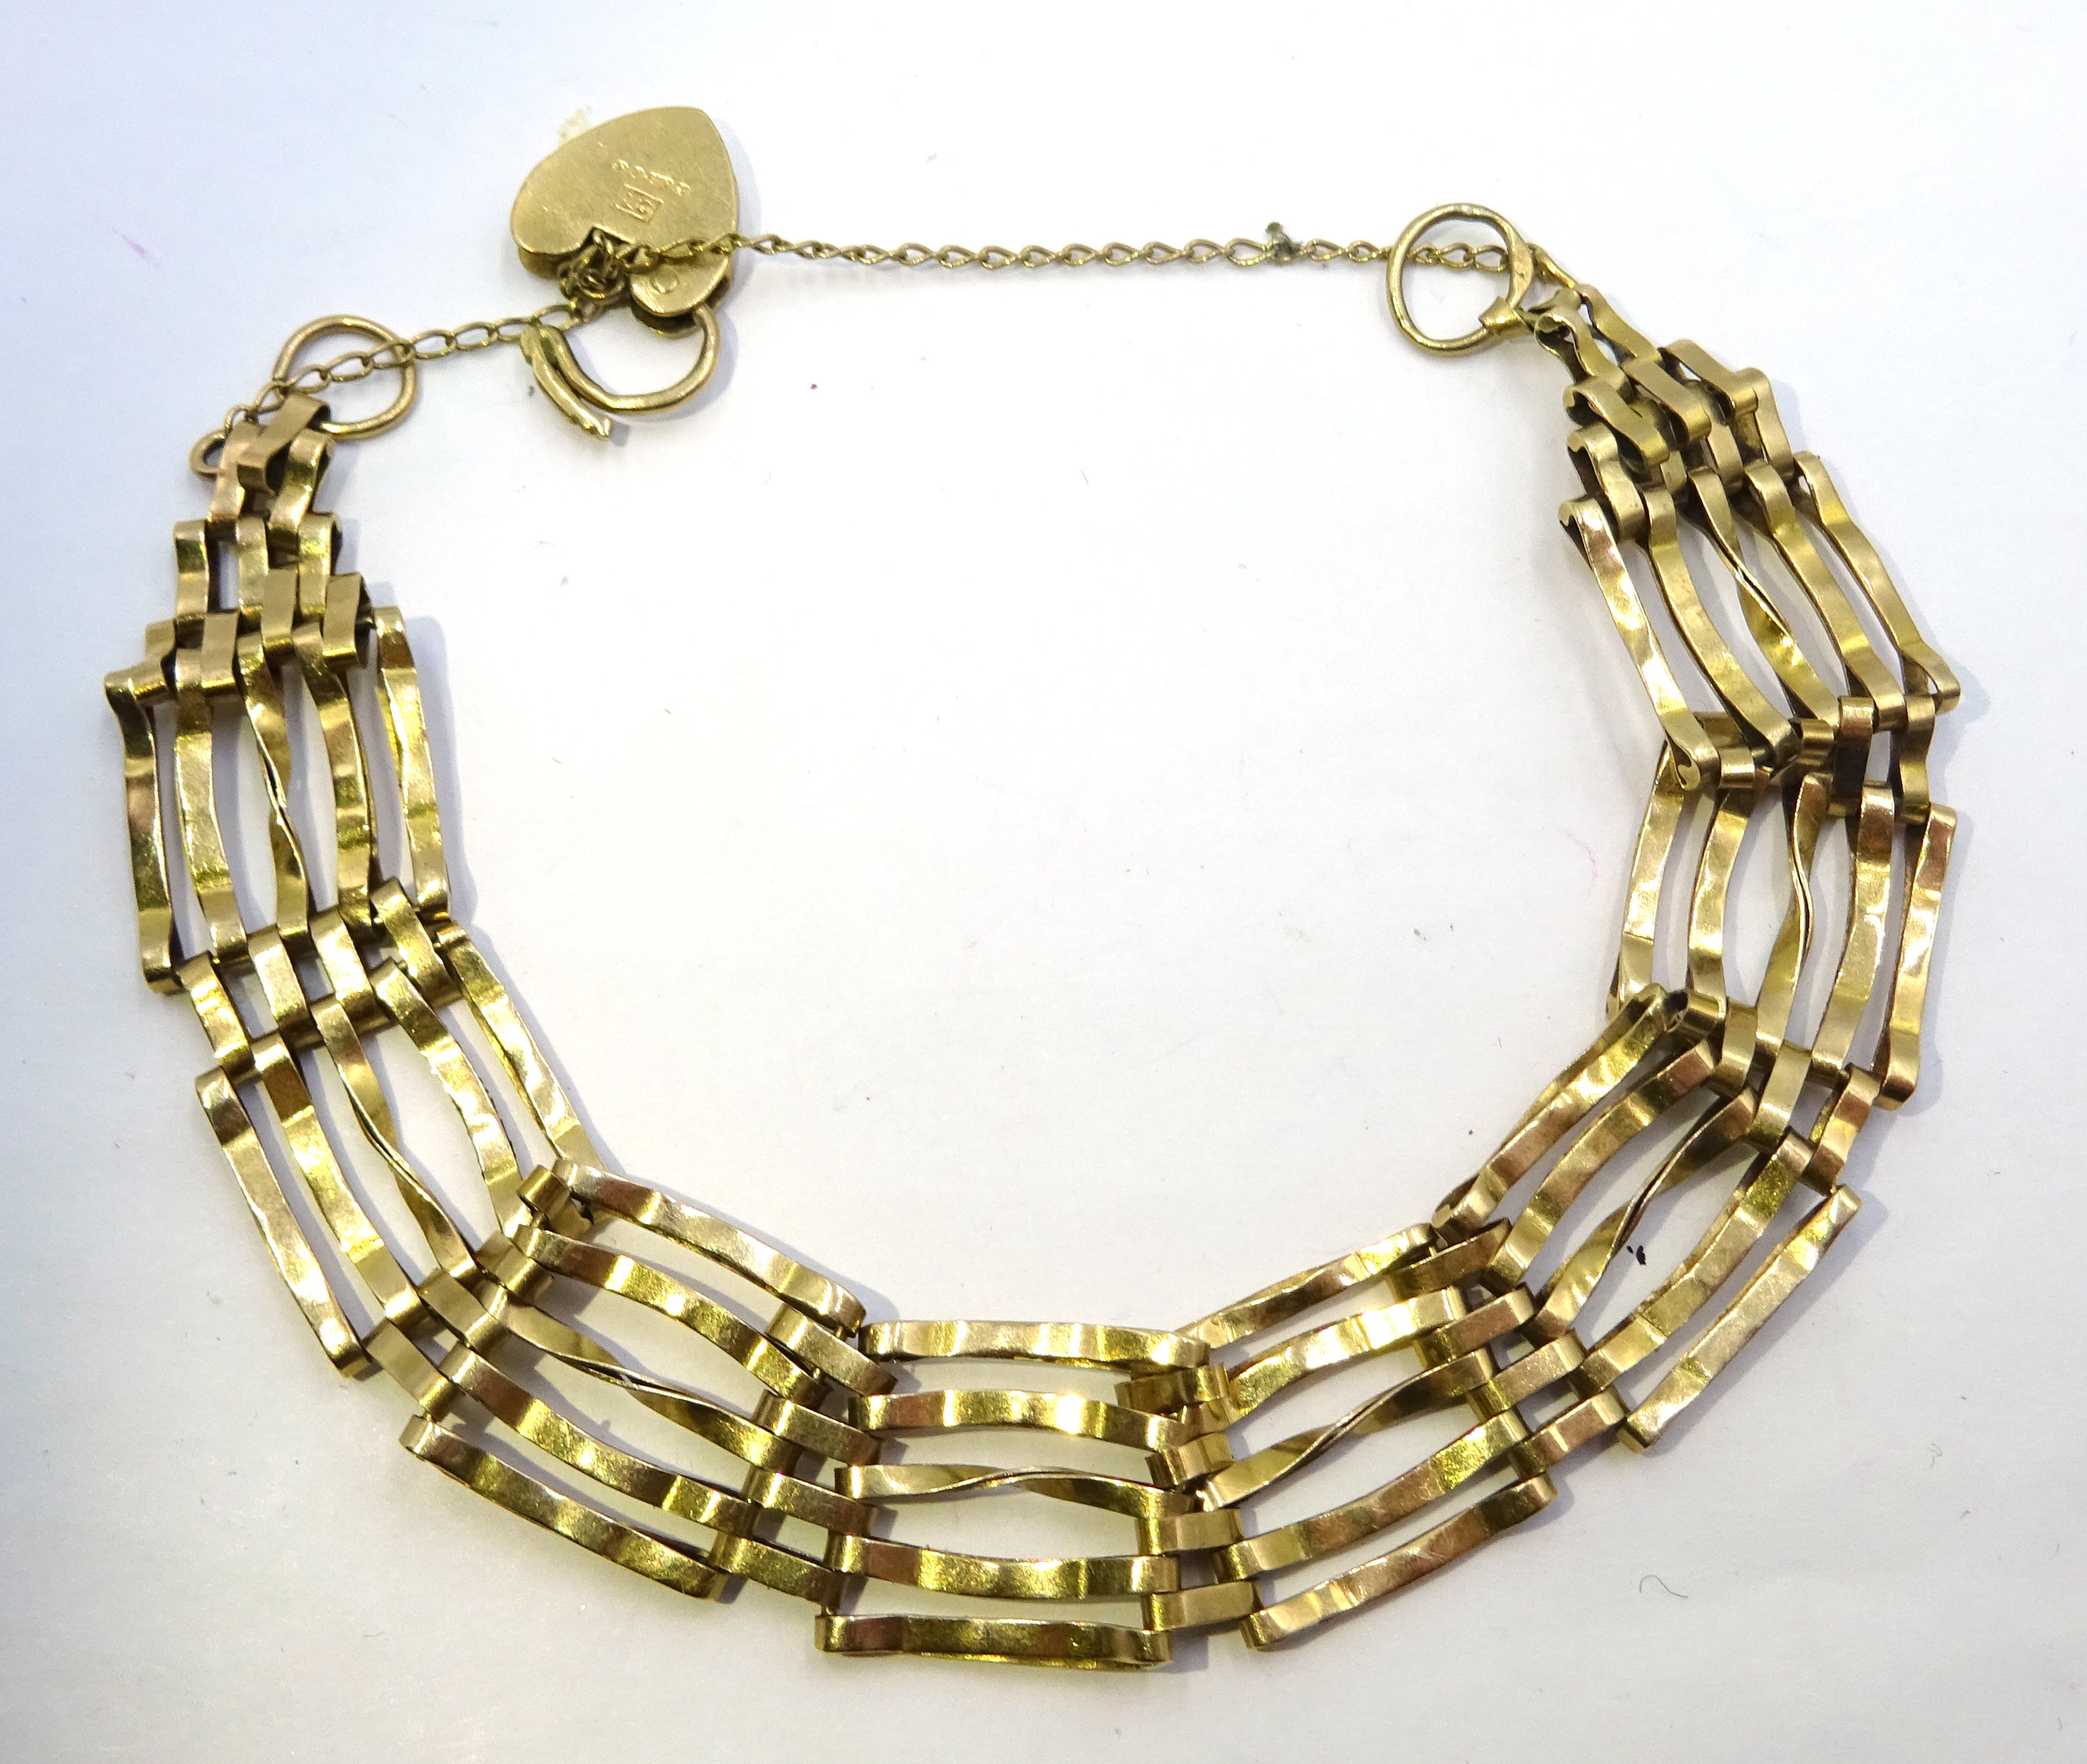 Lot 1014 - 9ct gold five bar link bracelet, hallmarked, approx 8.